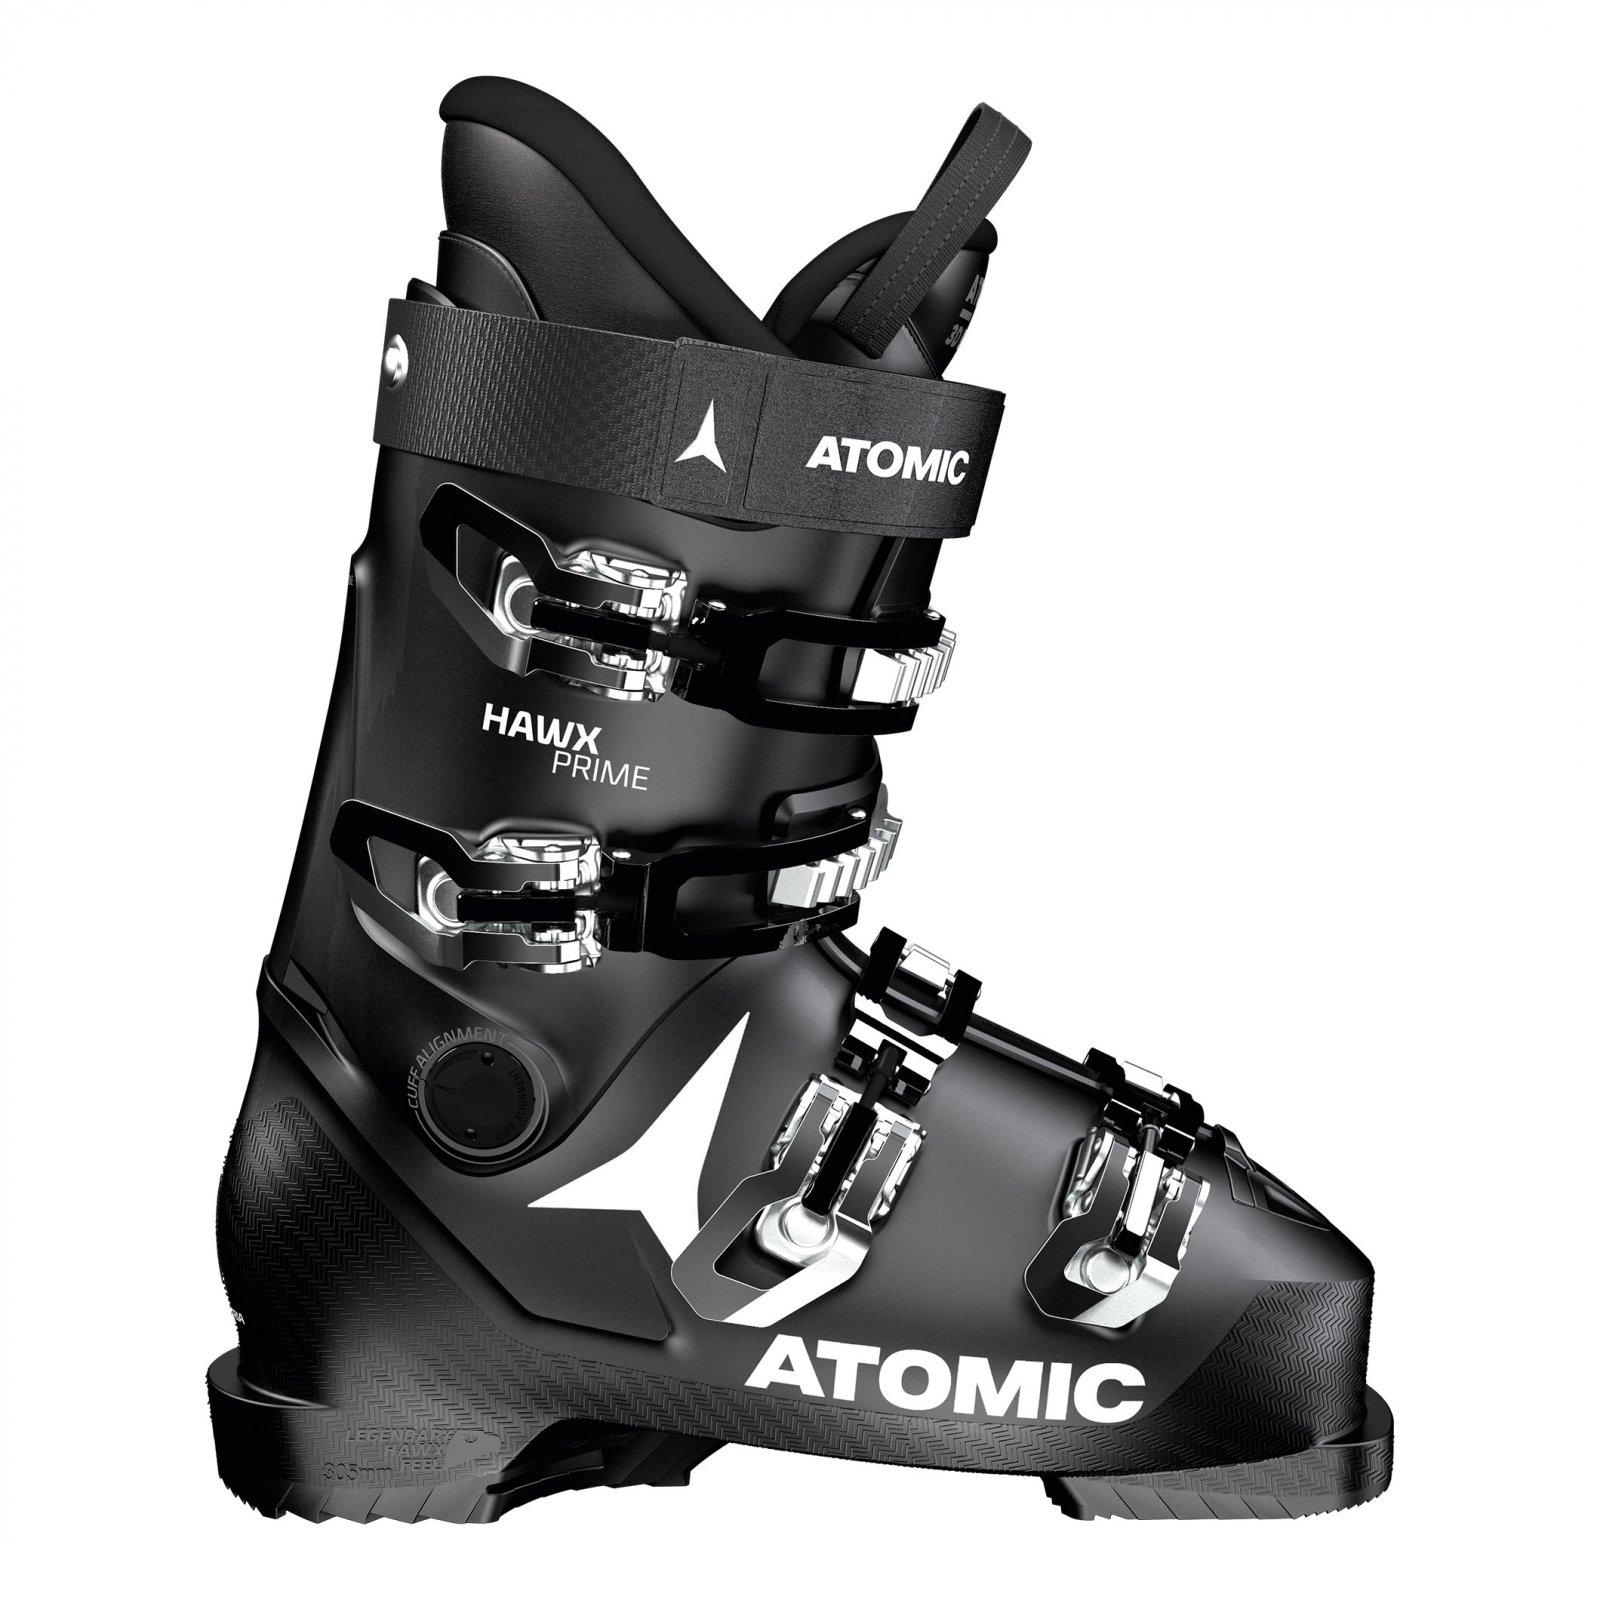 2022 Atomic Hawx Prime Men's Ski Boots